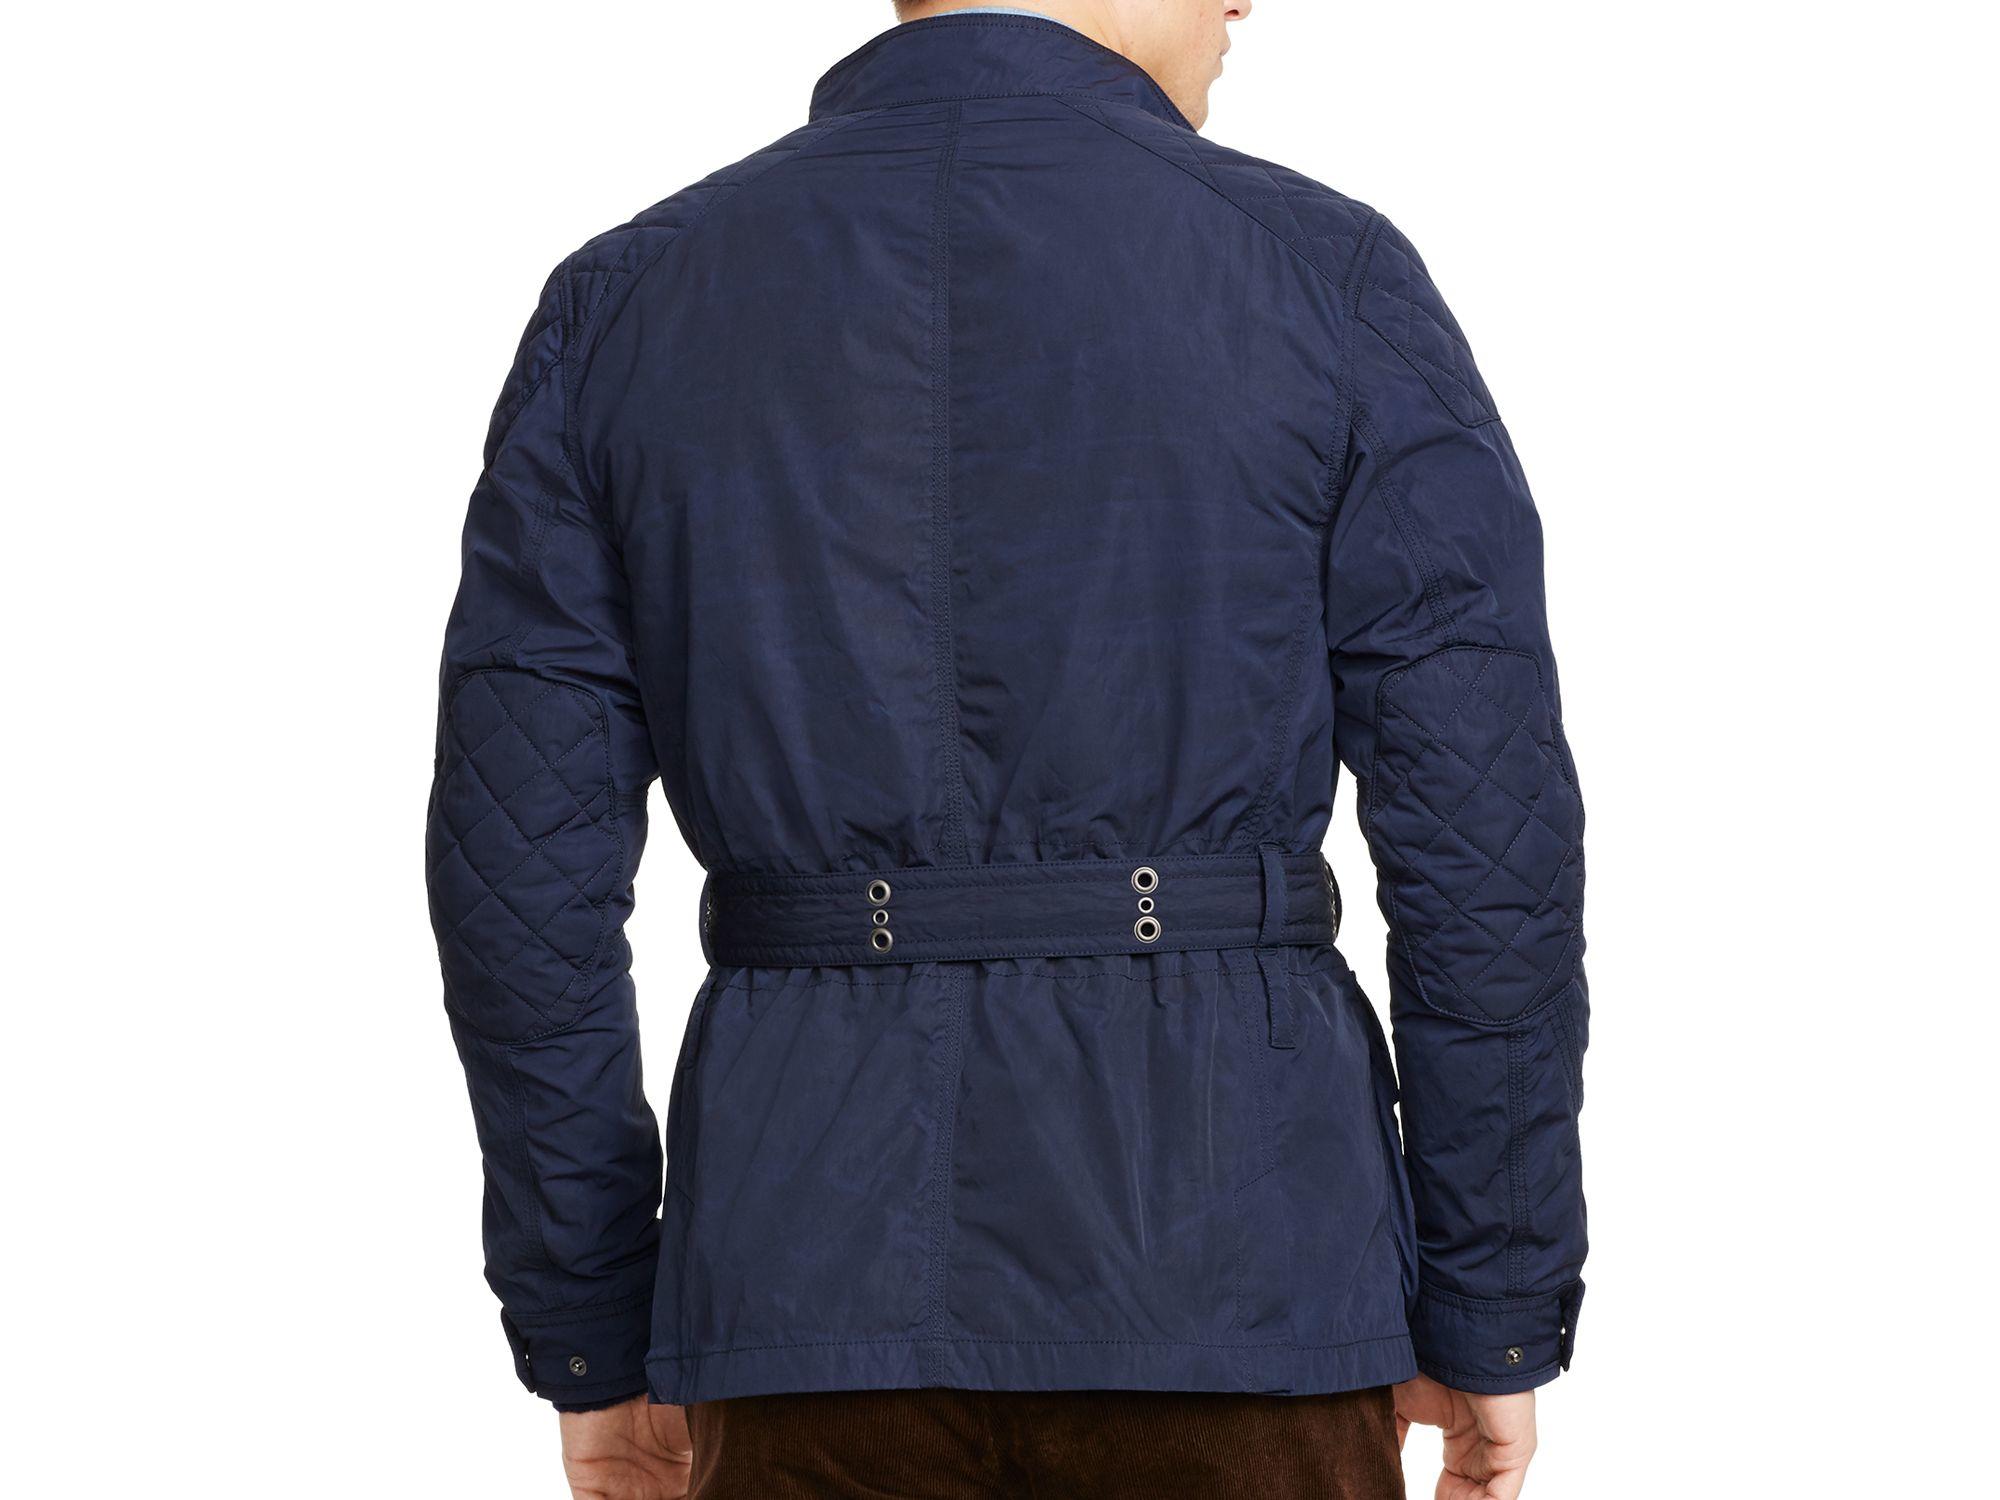 Ralph Lauren Polo 4 Pocket Suspension Jacket In Blue For